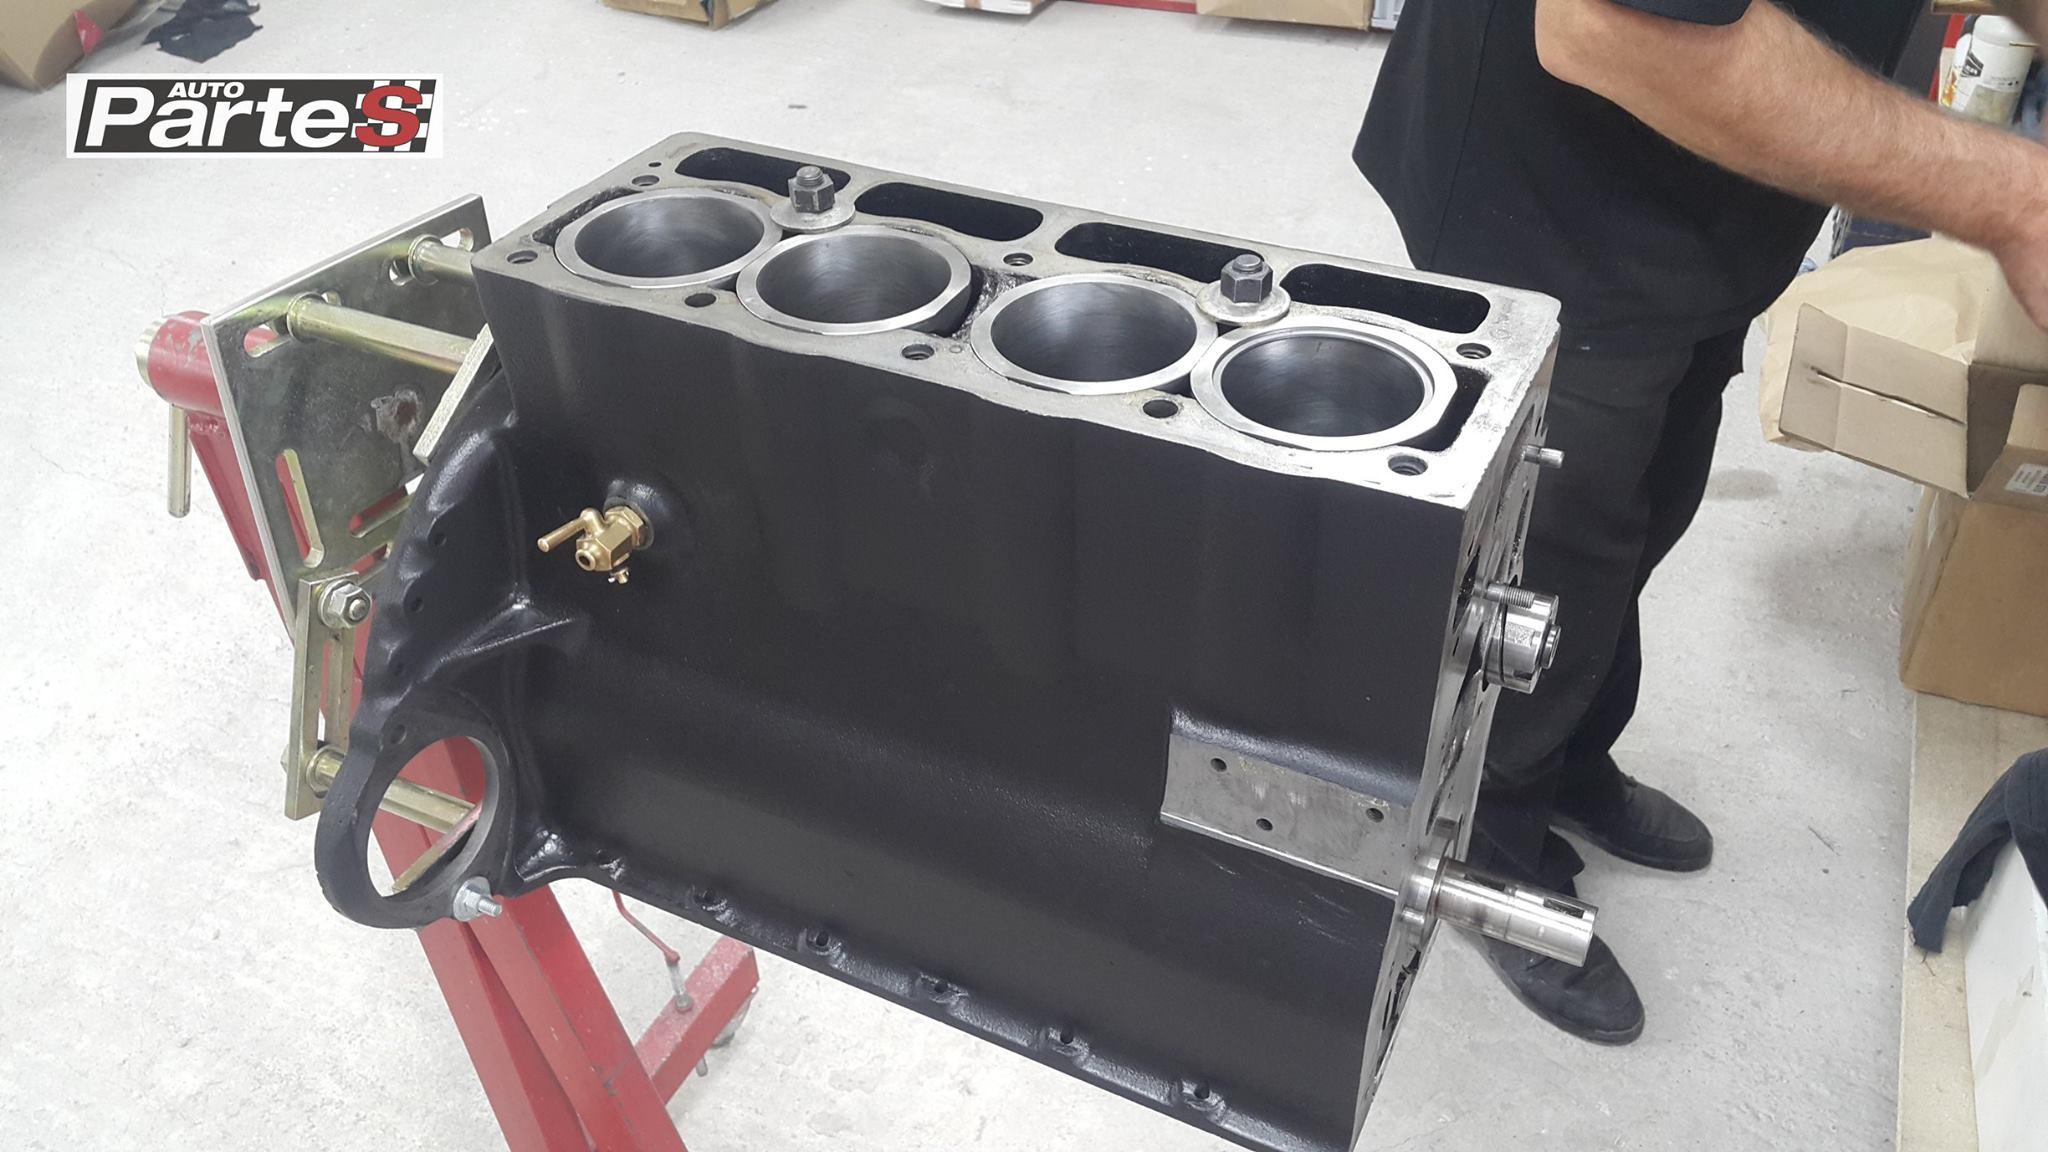 Superior Auto Parts >> Dandy Classics|Triumph TR2 better than new after epic restoration